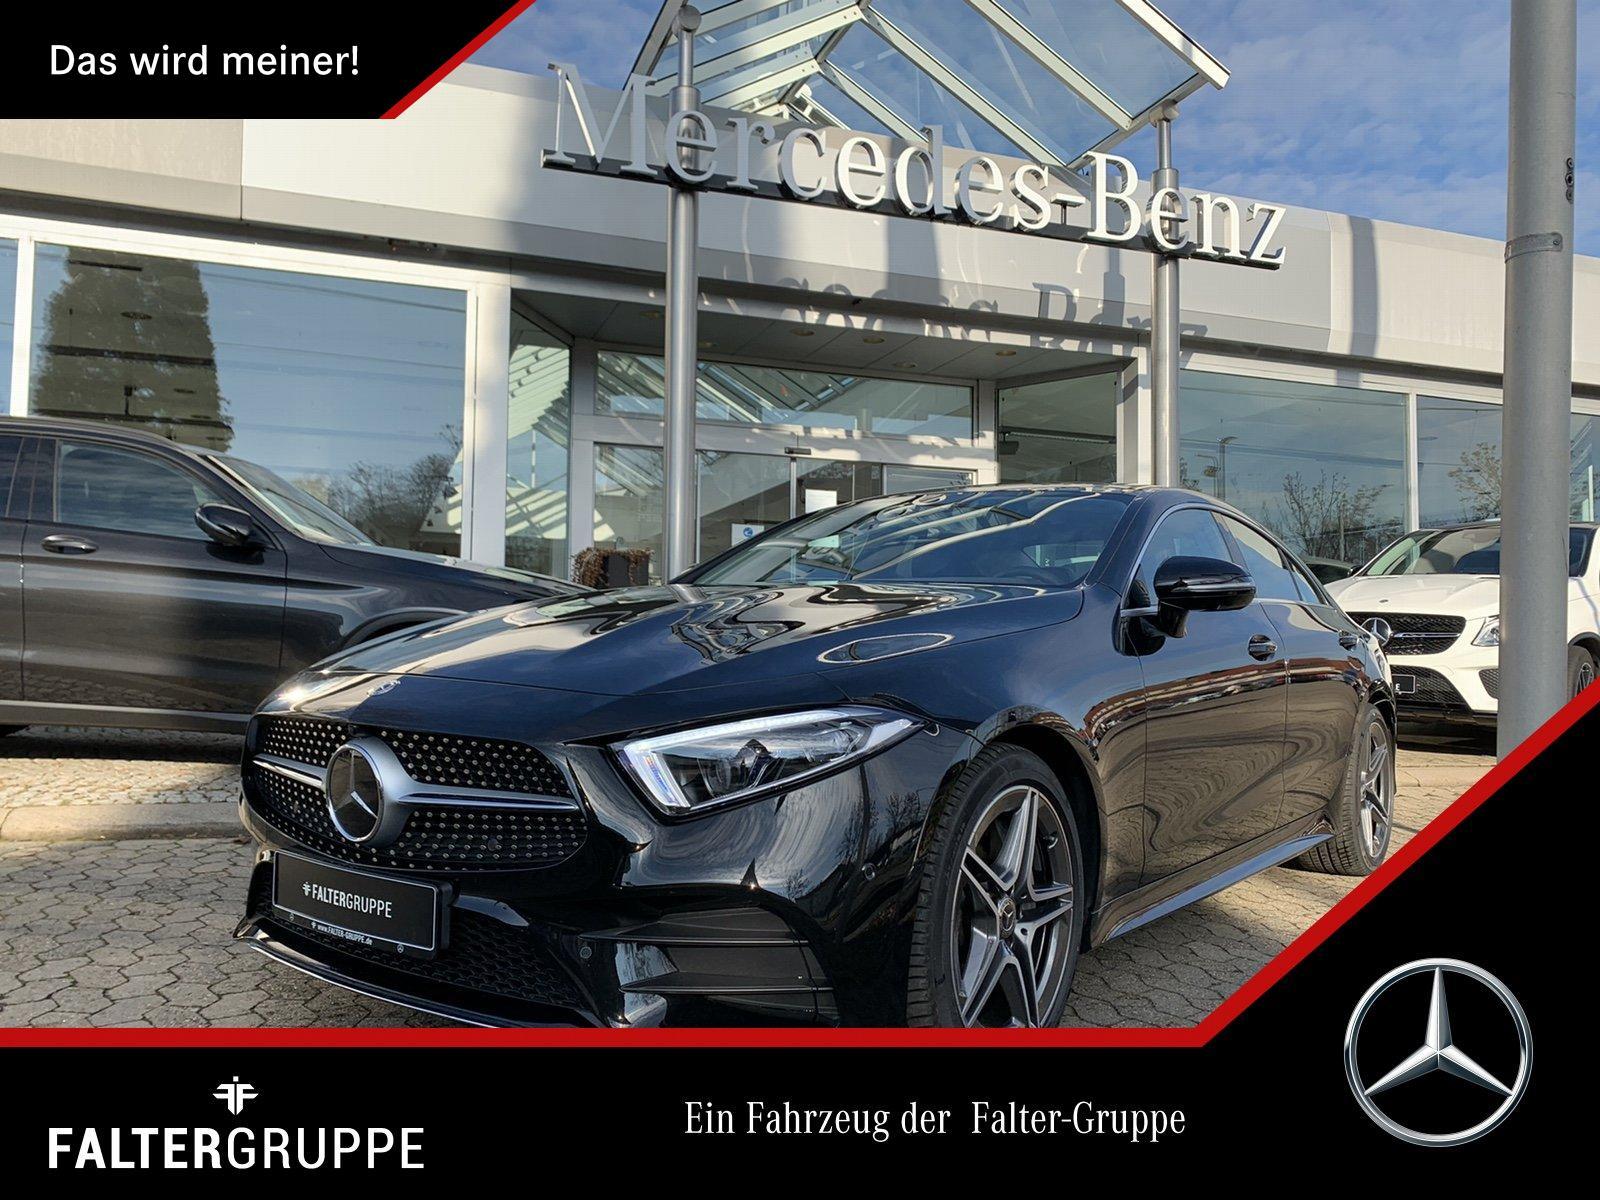 Mercedes-Benz CLS 400d 94.908-AMG DISTR ABC MLED GSD Widescrn, Jahr 2019, Diesel